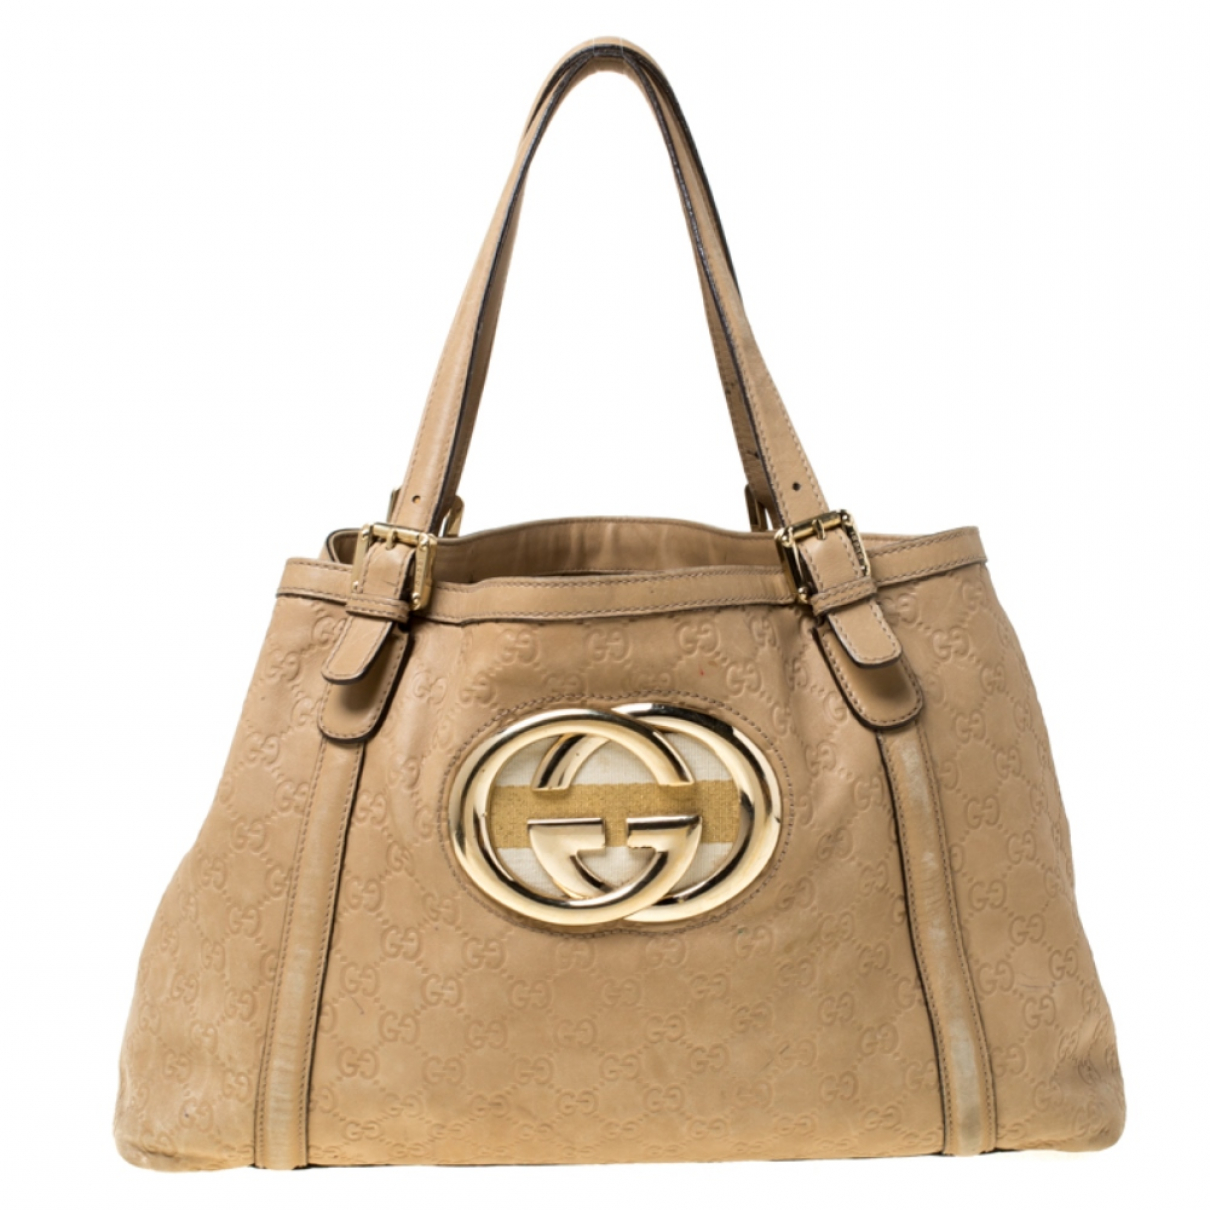 Gucci \N Beige Leather handbag for Women \N